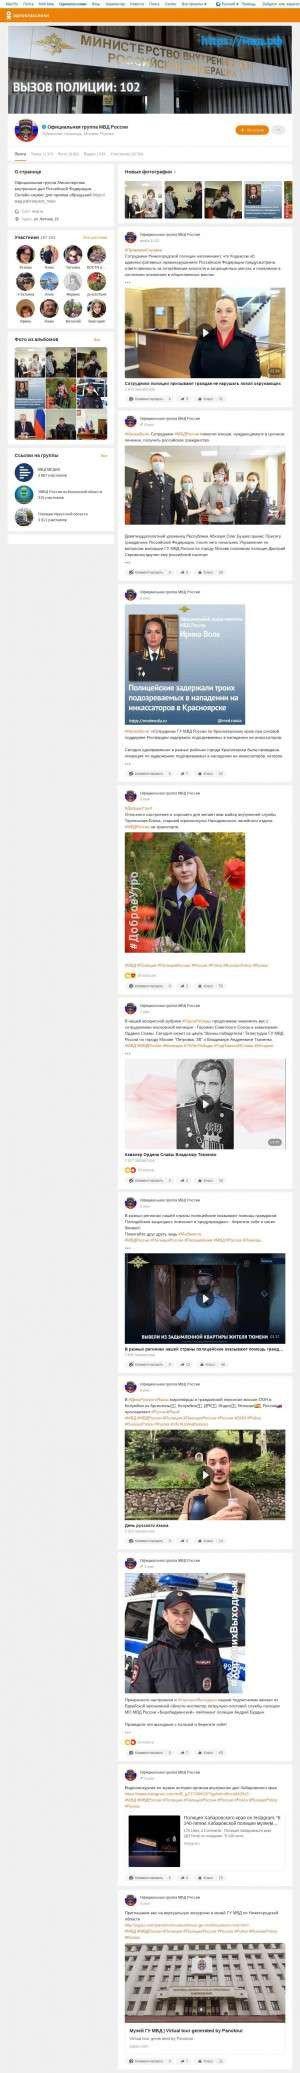 Предпросмотр для www.odnoklassniki.ru — УМВД России по г. Петрозаводску Спецприемник